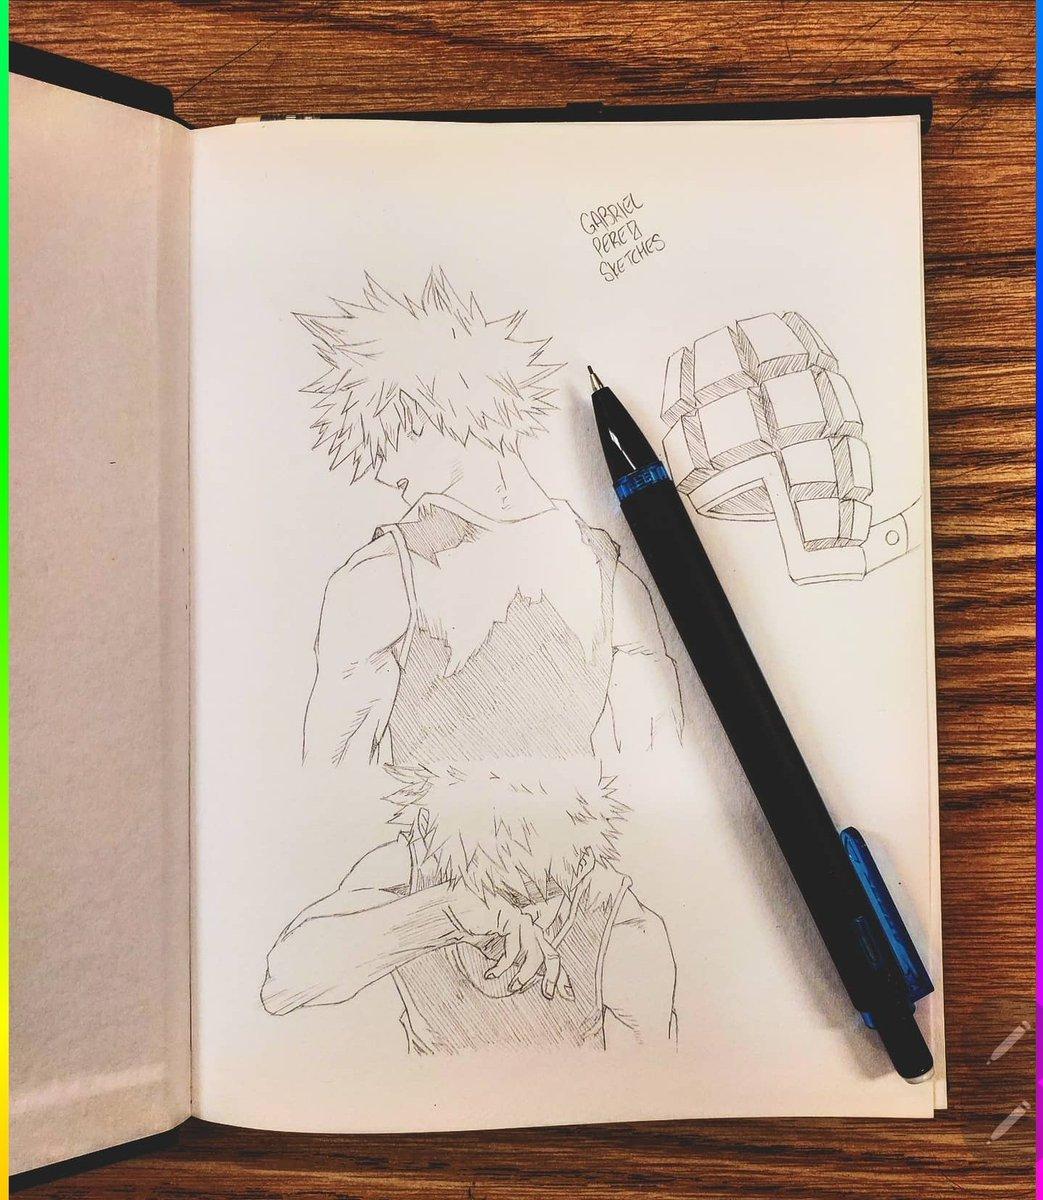 Katsuki Bakugo 🖊️  #sketchbook #sketchbookart #sketching #sketchbookdrawing #dailysketches #sketchdaily #pendrawing #quicksketch #justdraw #sketchpad #sketchoftheday #pencildrawing #figuredrawing #drawsomething #draweveryday #artofdrawing #drawdaily #inkdrawing #mysketchbook https://t.co/ai8PCM2HXO